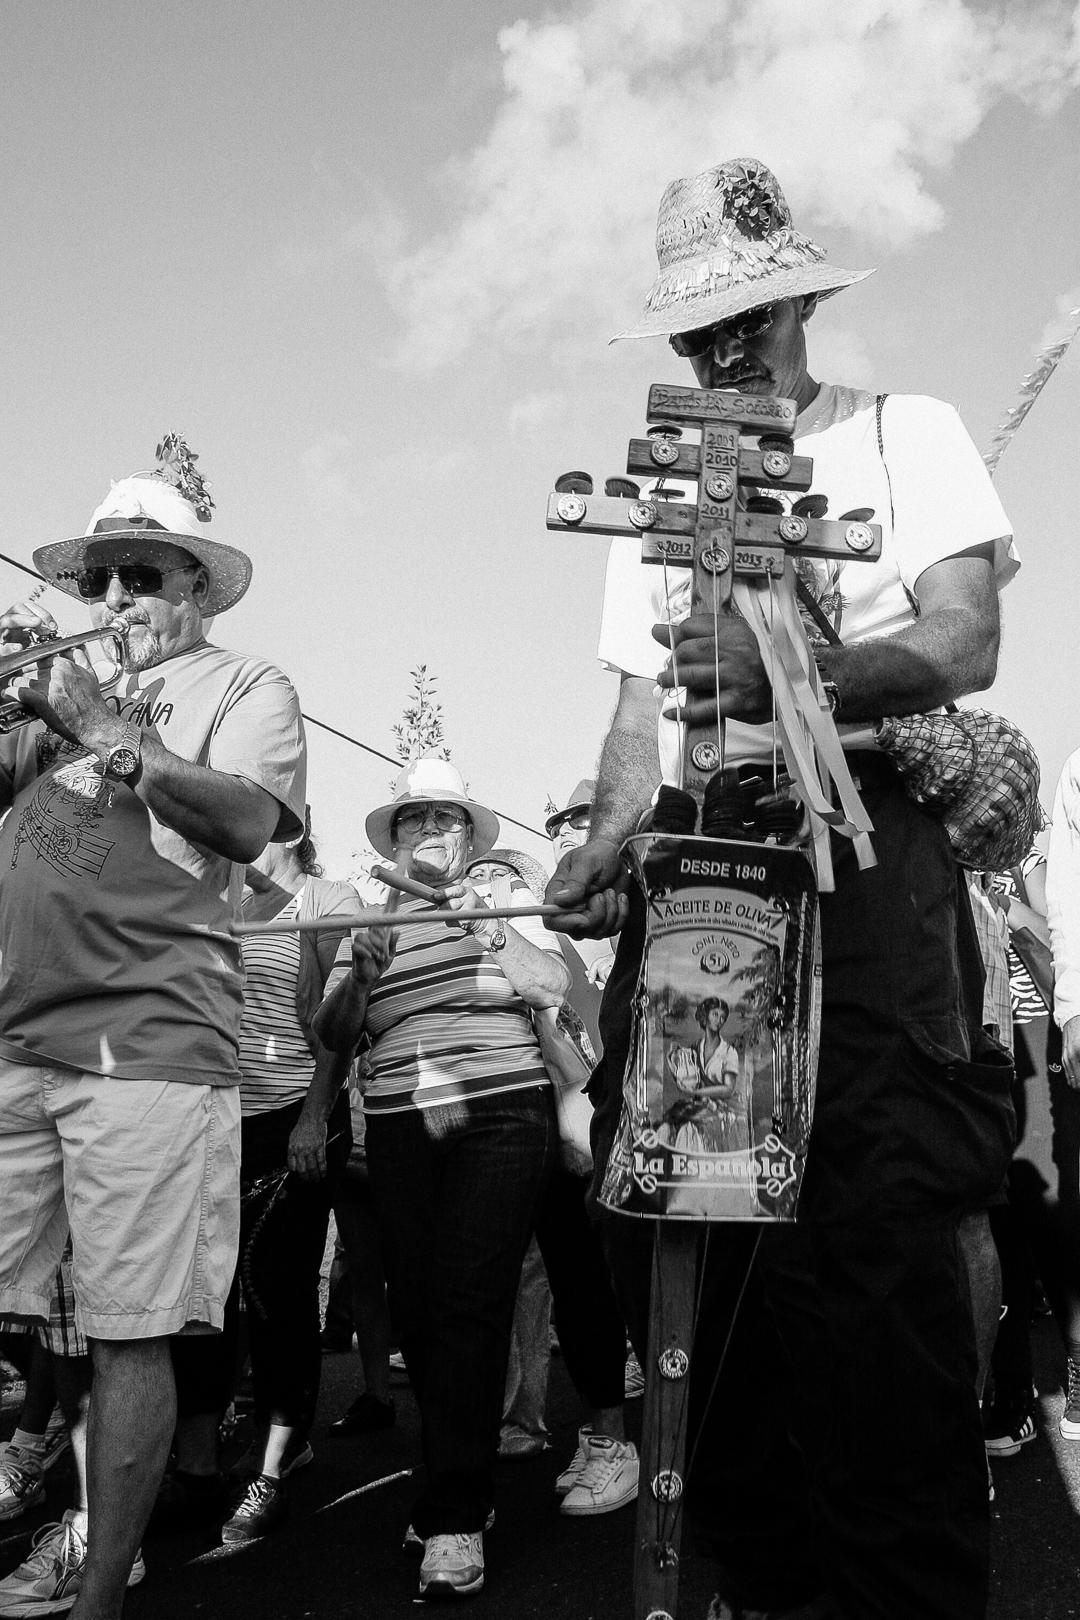 Romeria, Guimar - Socorro; Famous inprovised instrument: Racha - racha